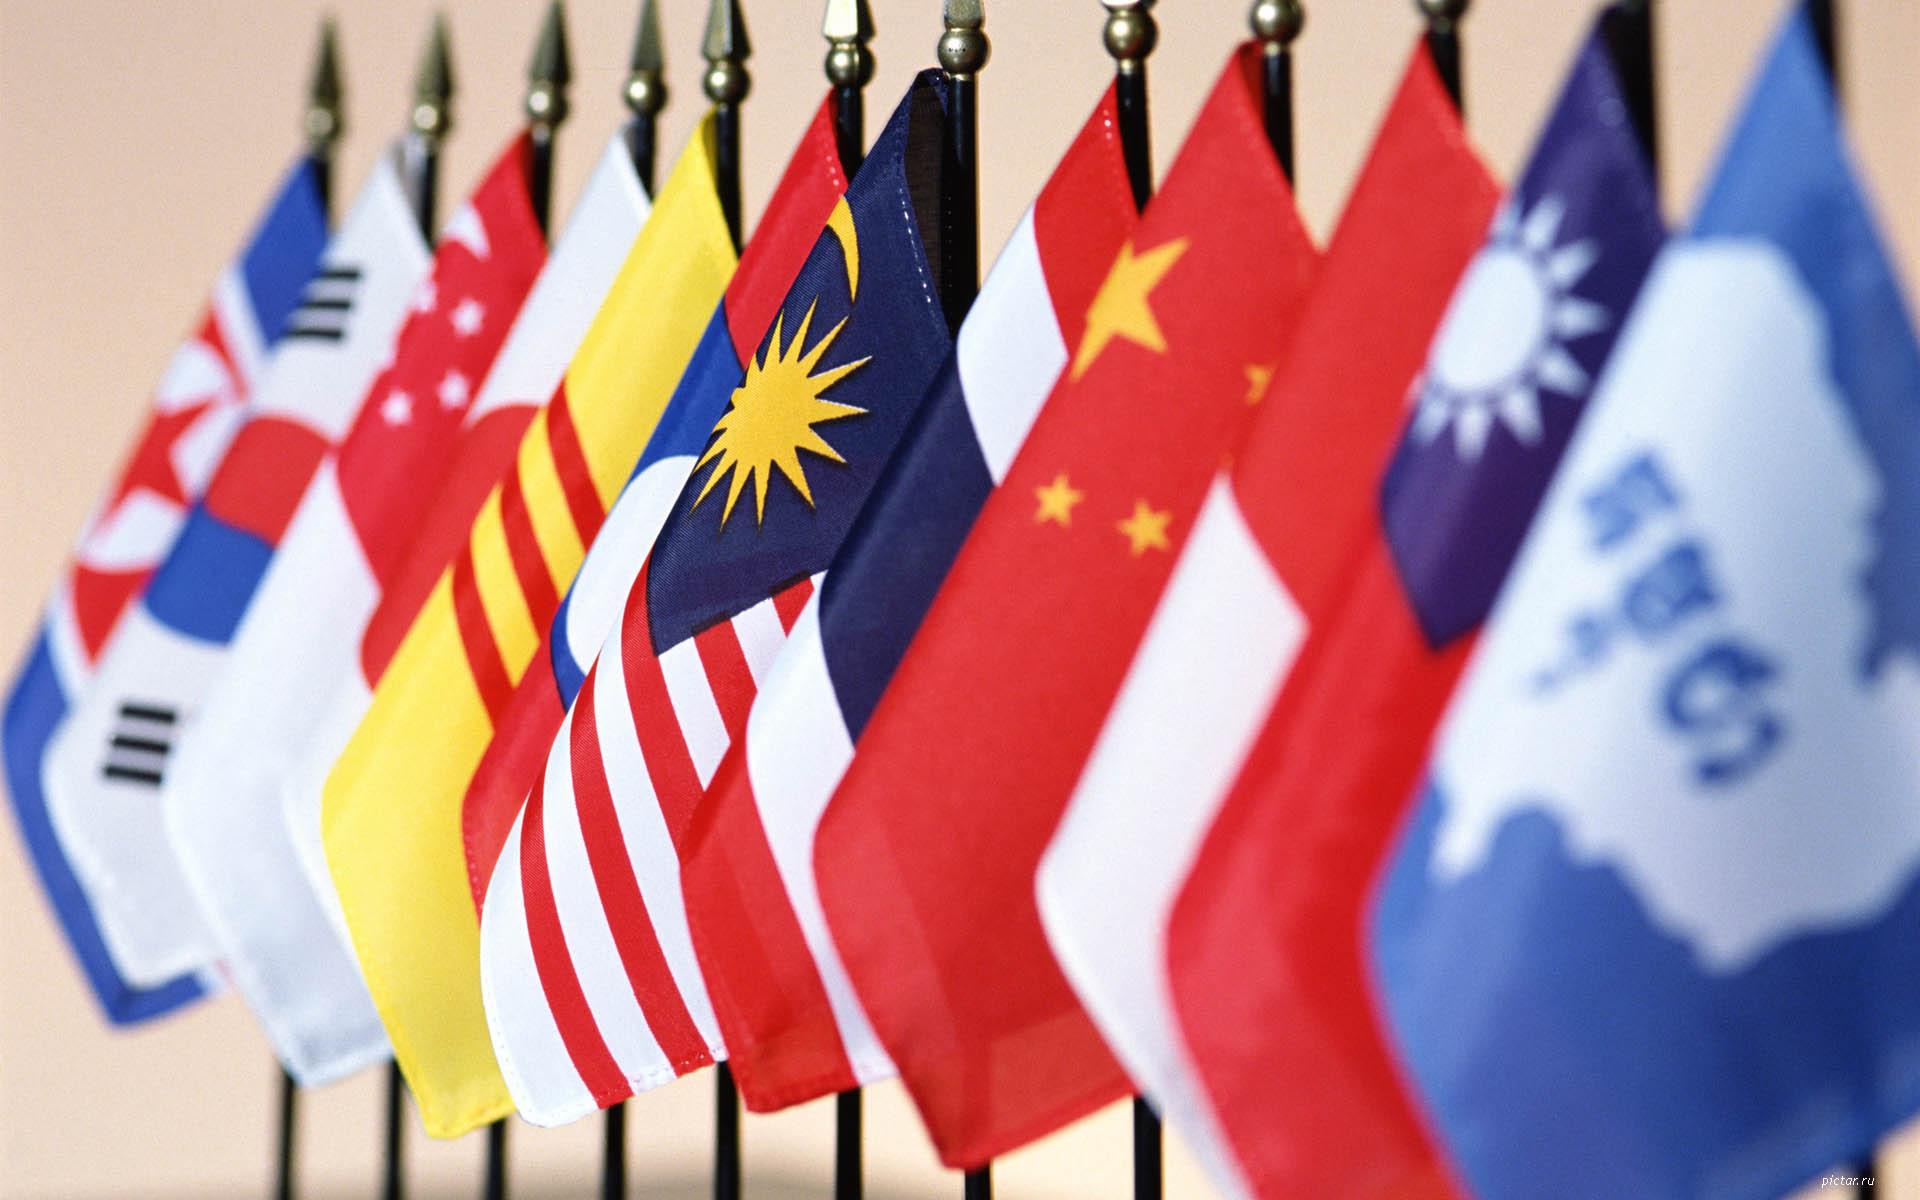 Флаги разных стран картинки флаги